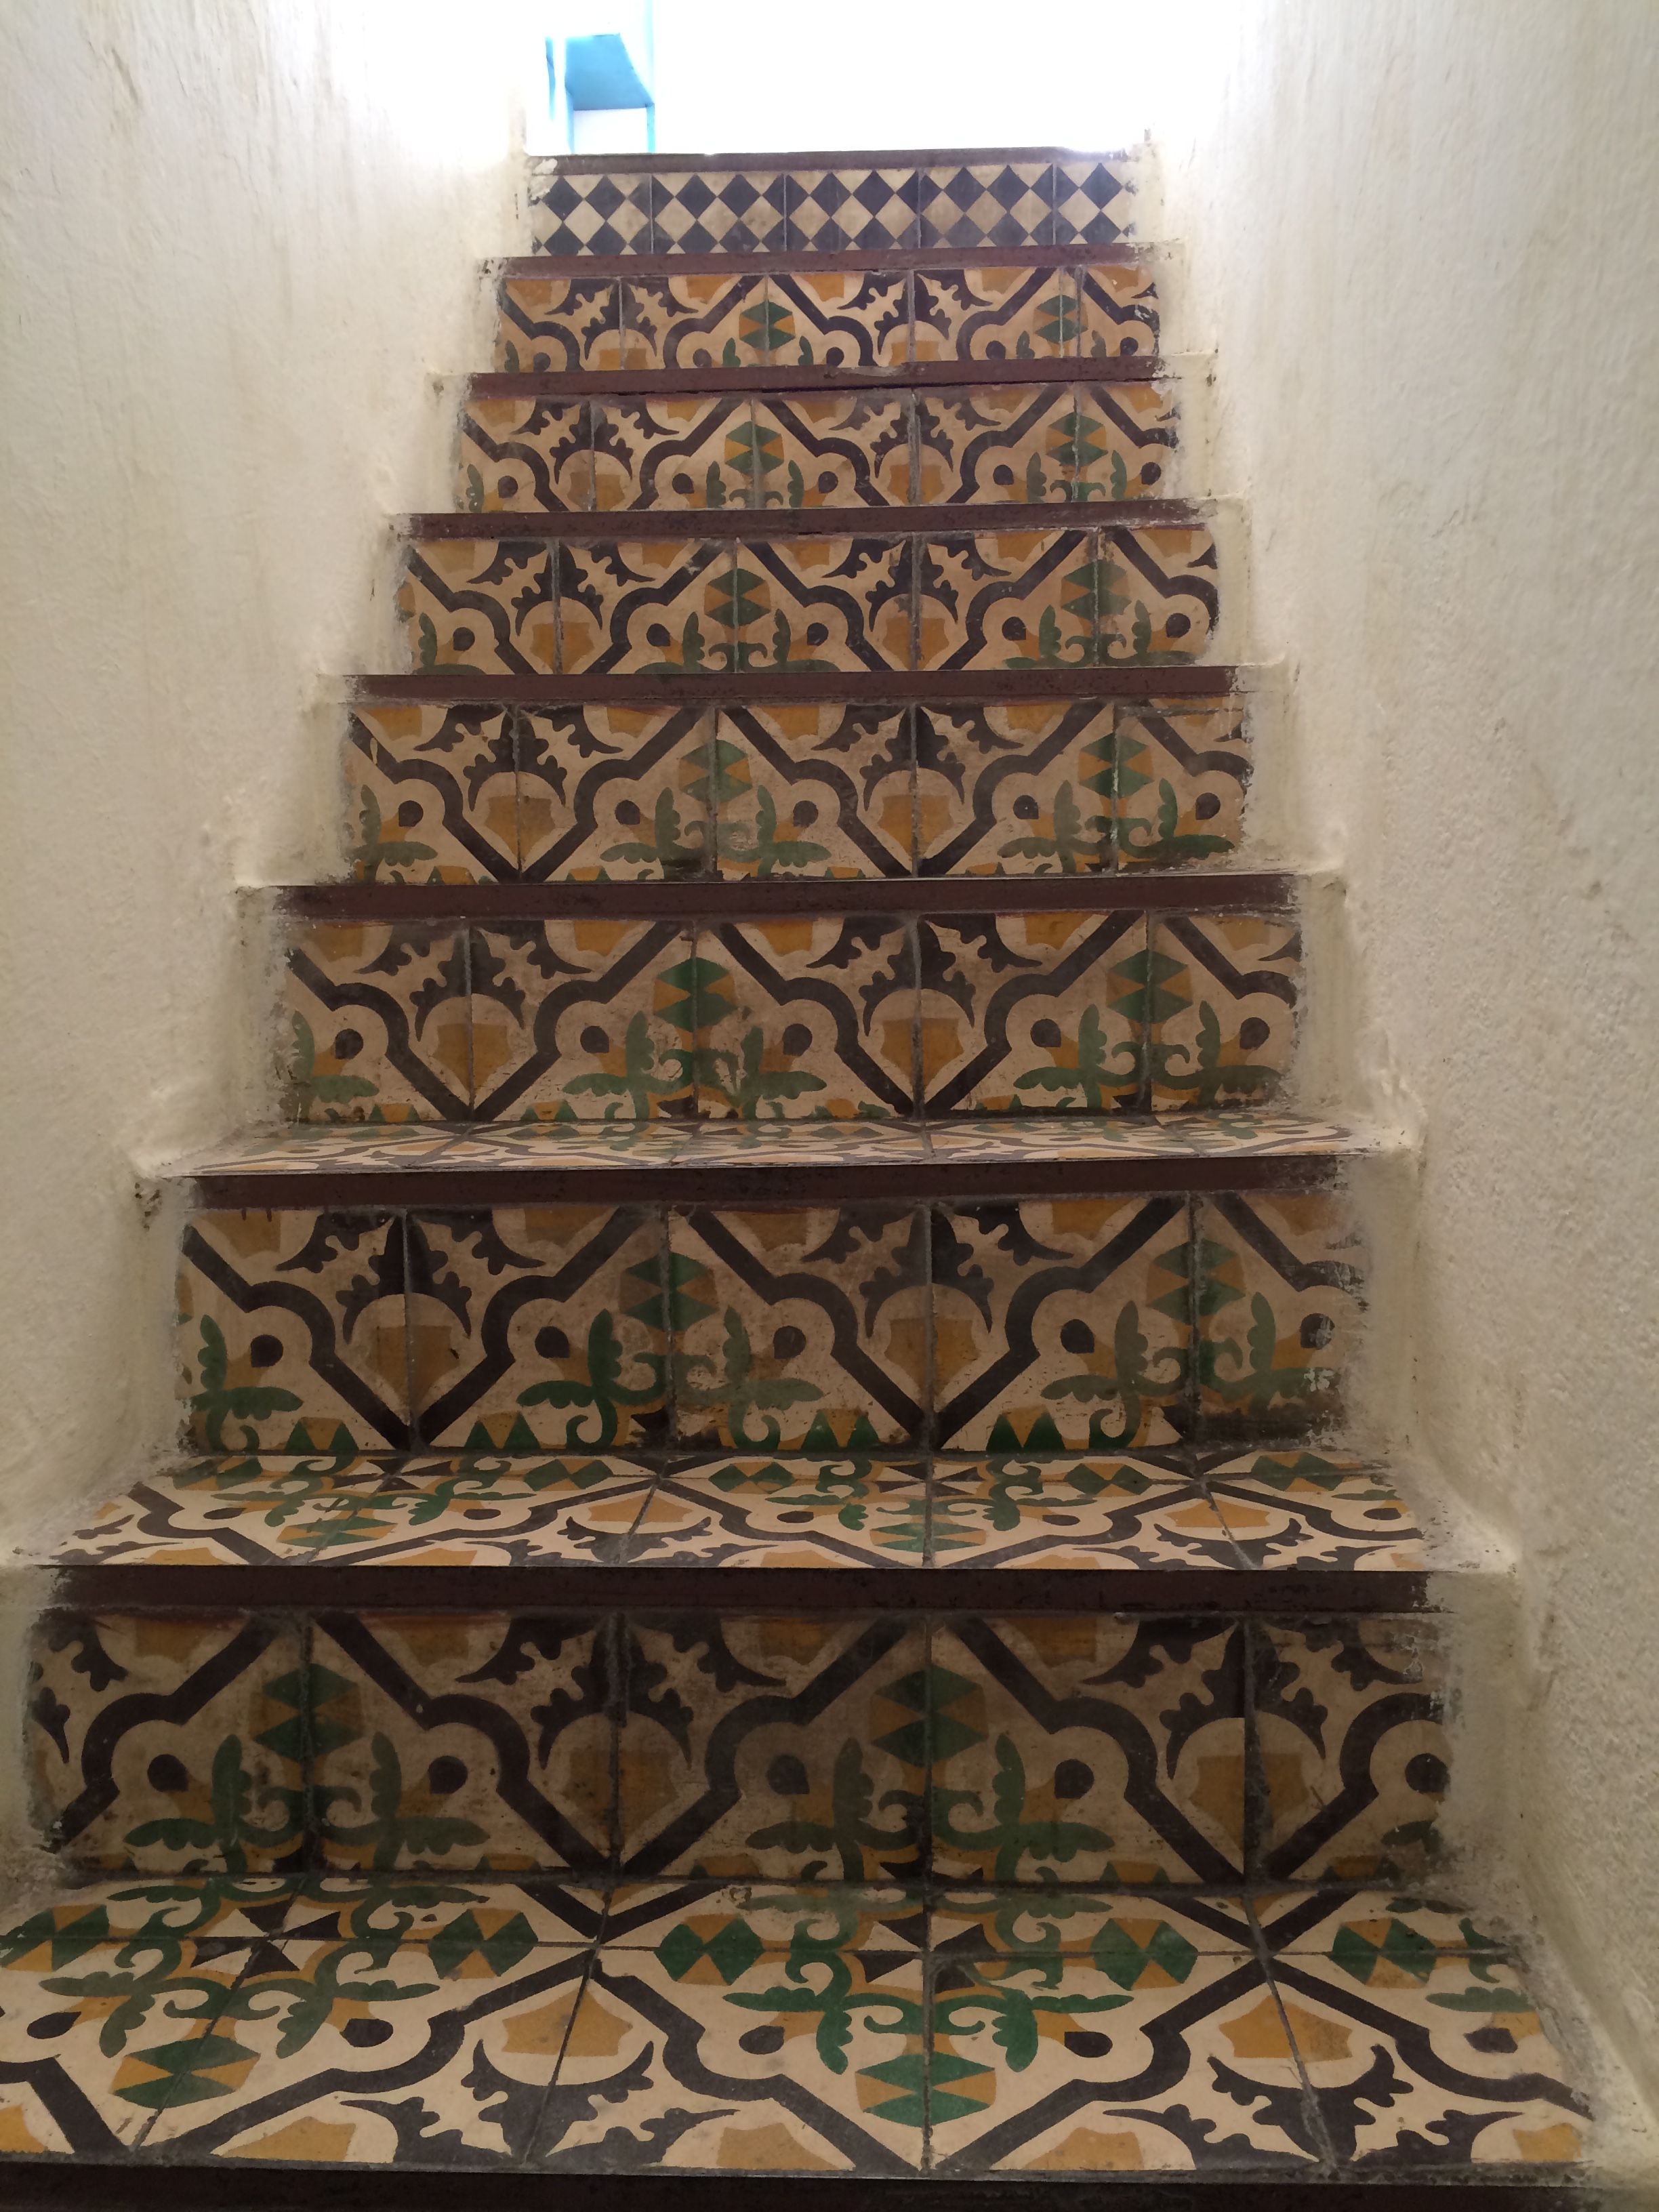 Zementfliesen Marokko Cement Tiles Morocco Zementfliesen Fliesen Zement